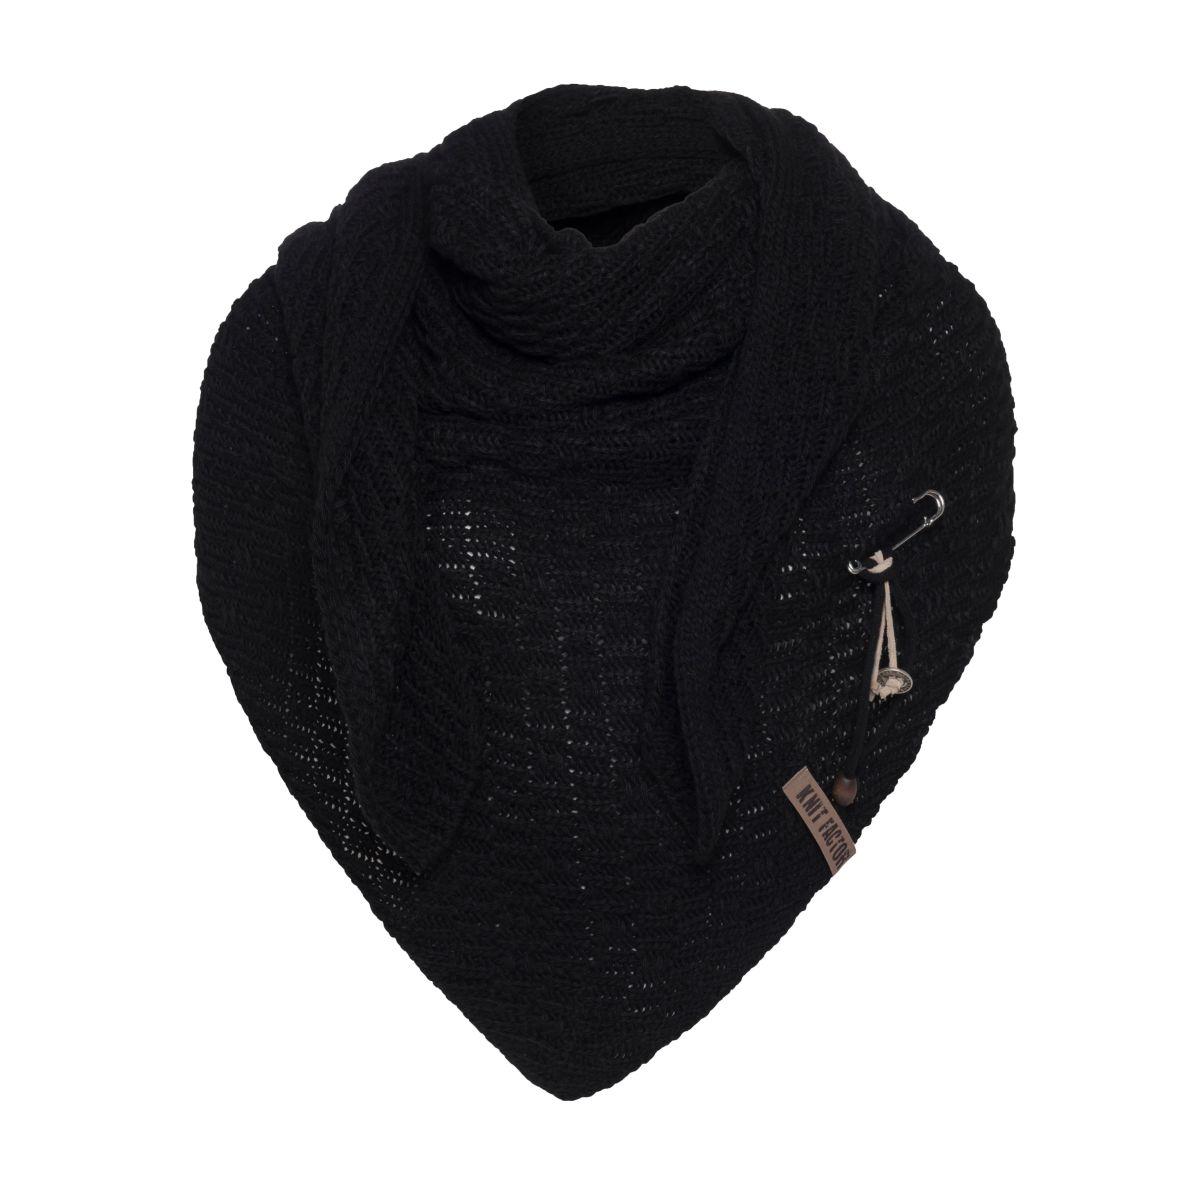 jaida omslagdoek zwart